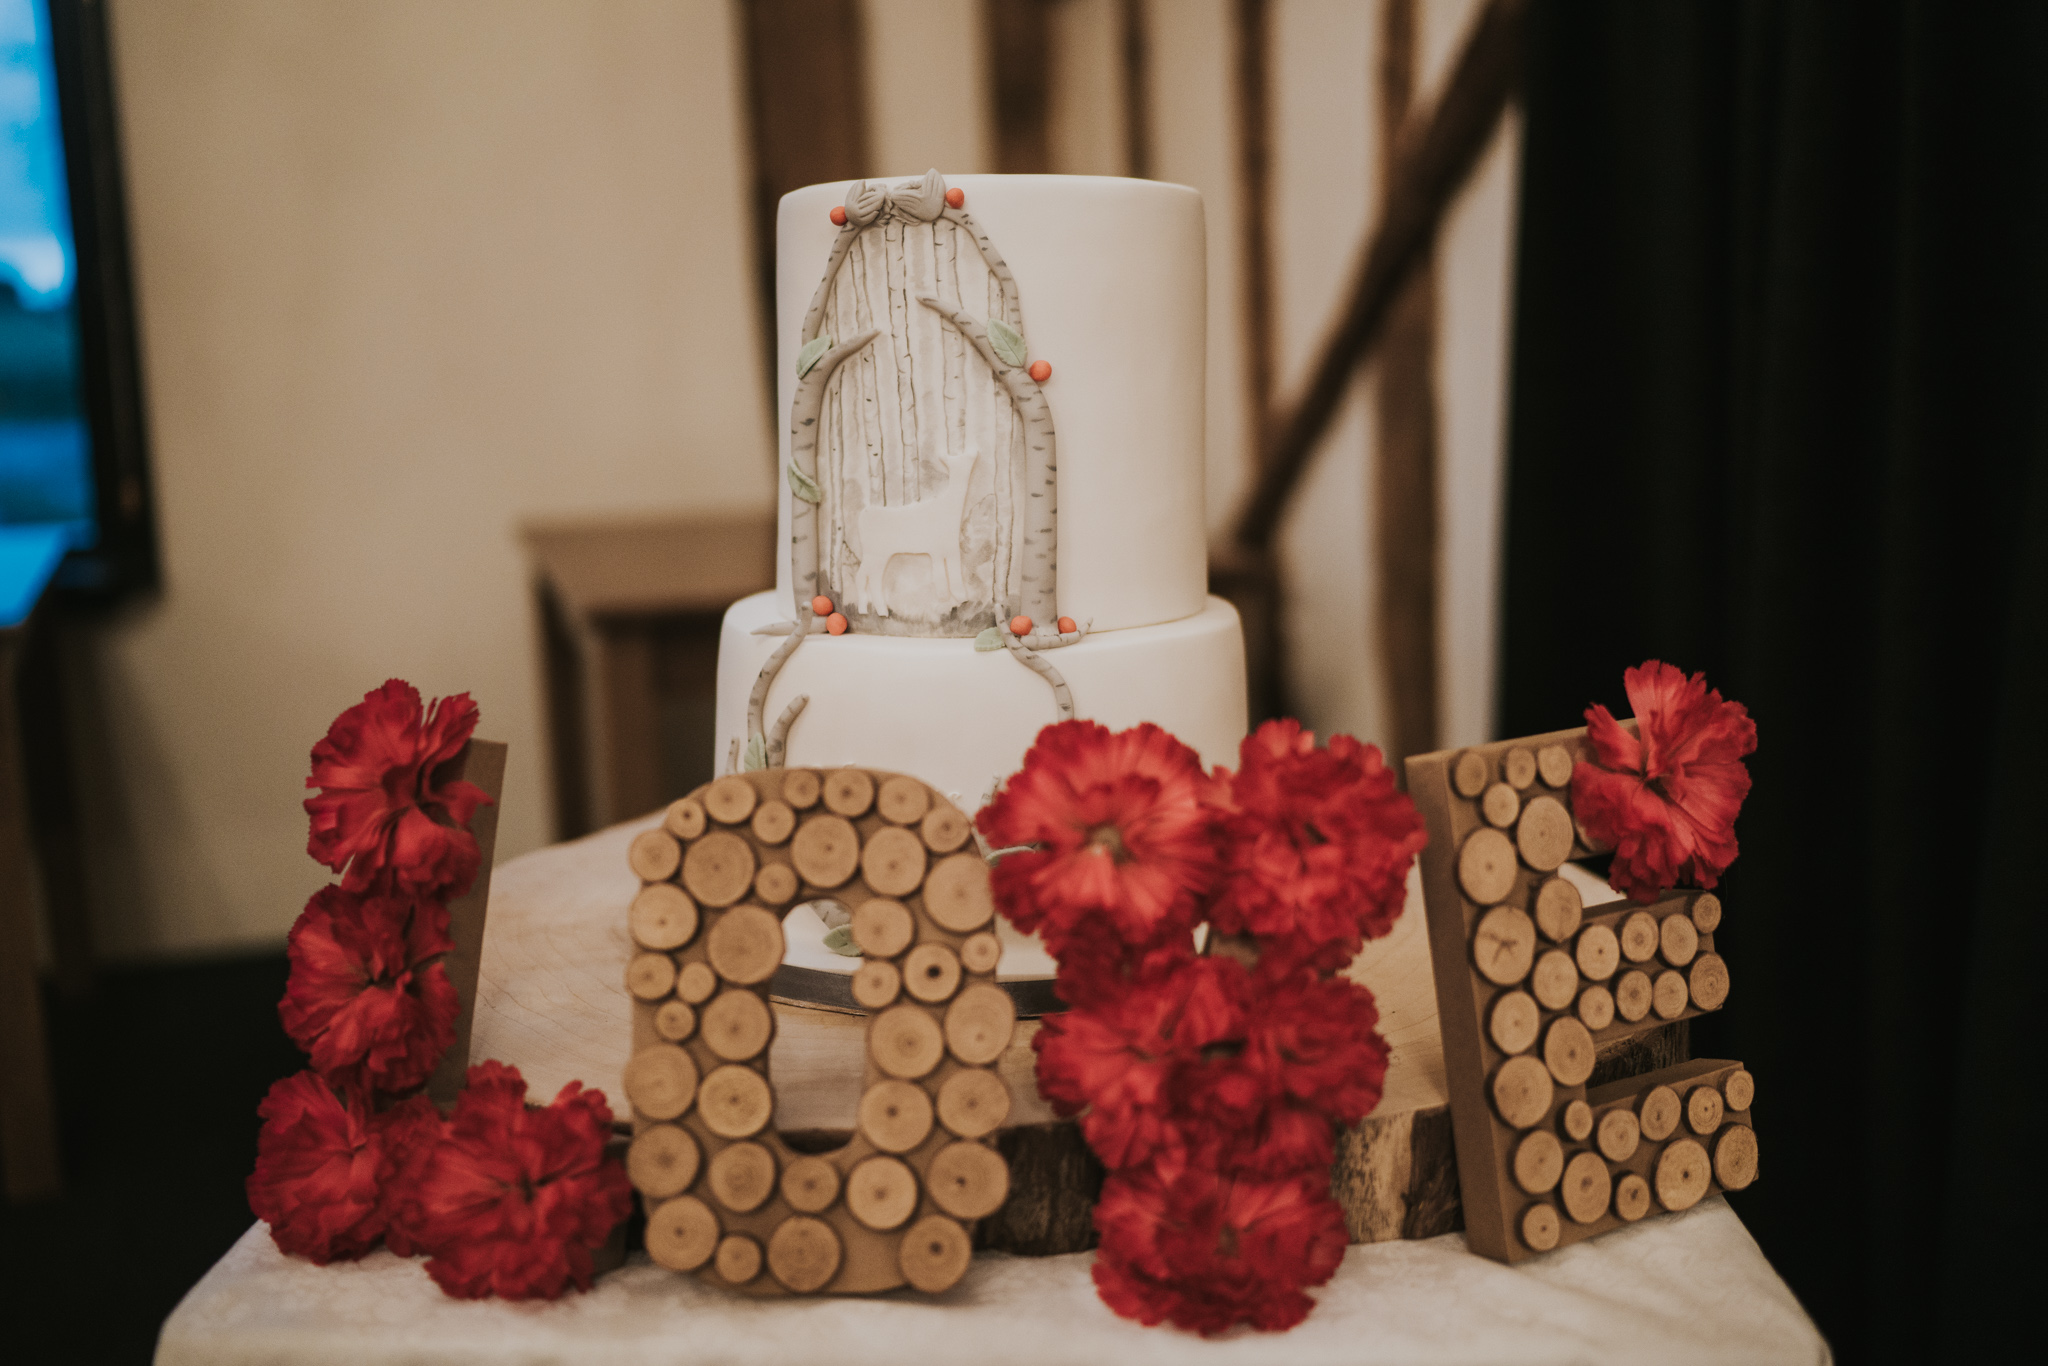 rhia-james-rustic-crabbs-barn-vintage-50s-retro-wedding-grace-elizabeth-colchester-essex-alternative-relaxed-wedding-family-photography-devon-suffolk-norfolk-essex (107 of 138).jpg